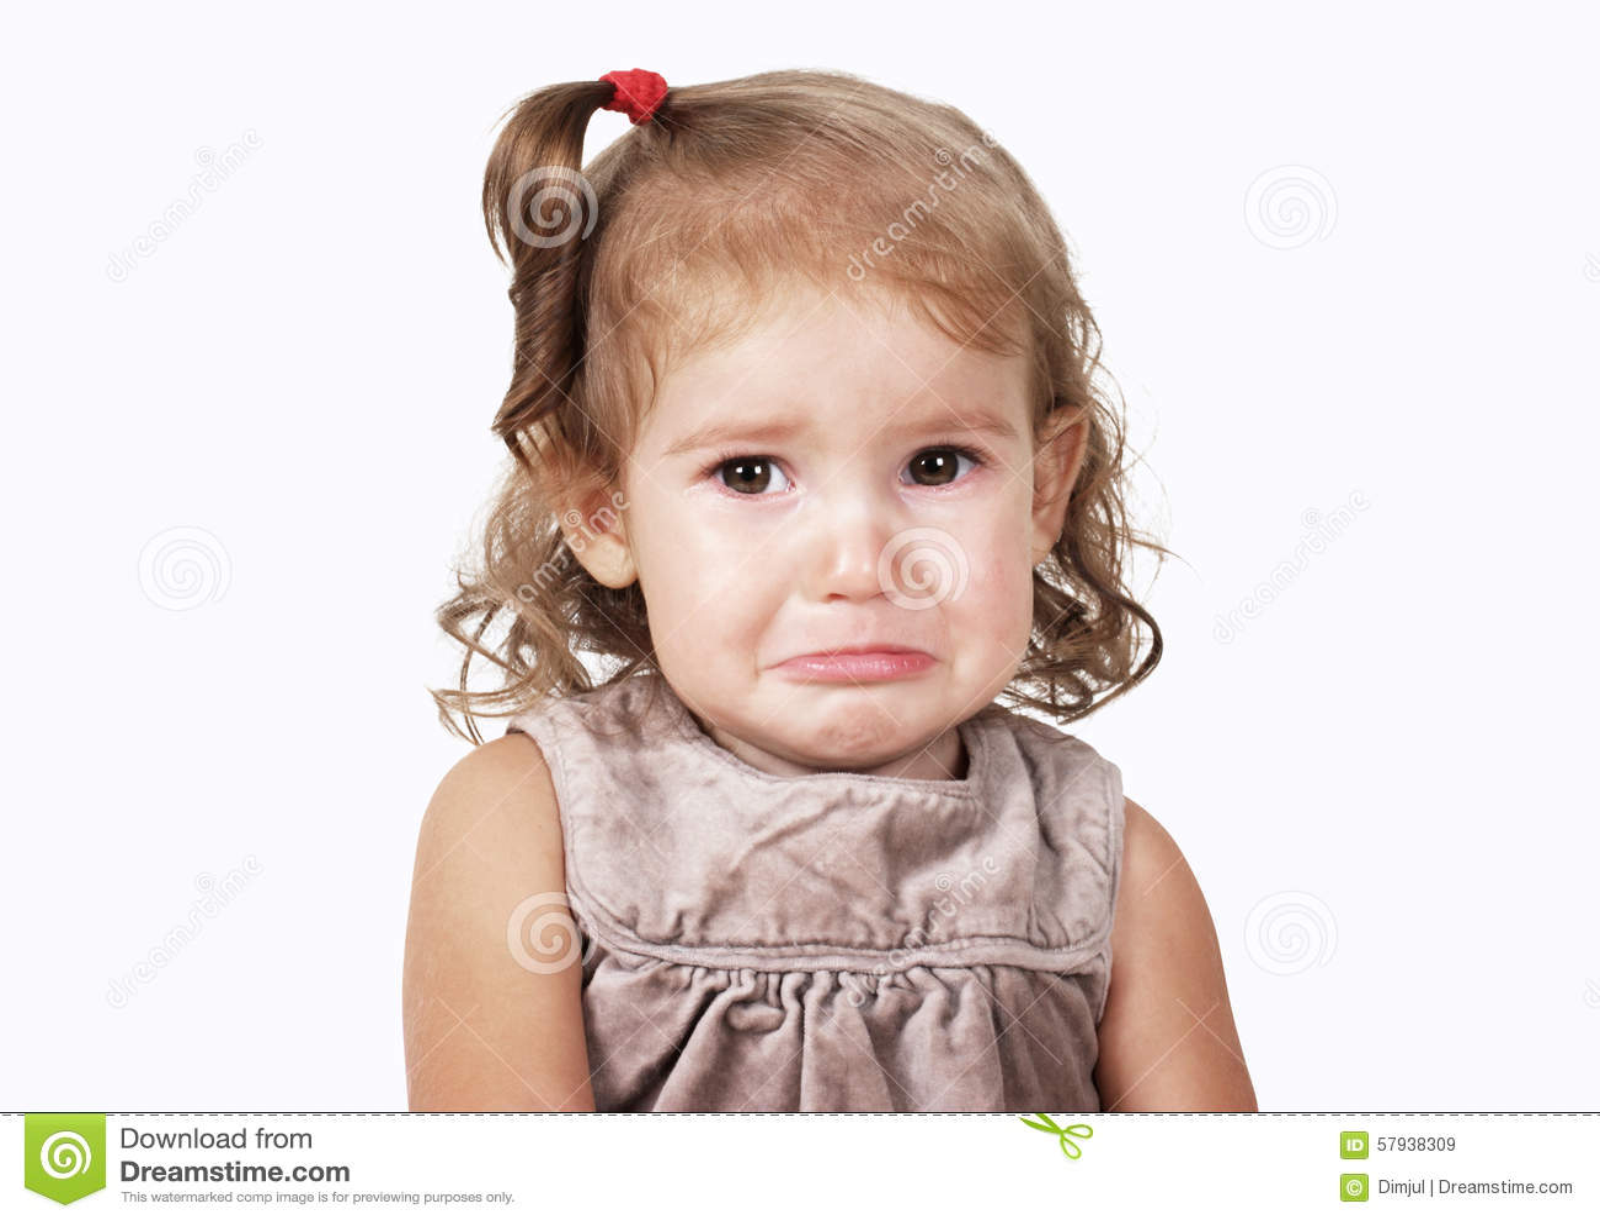 portrait of sad crying baby girl isolated on white stock